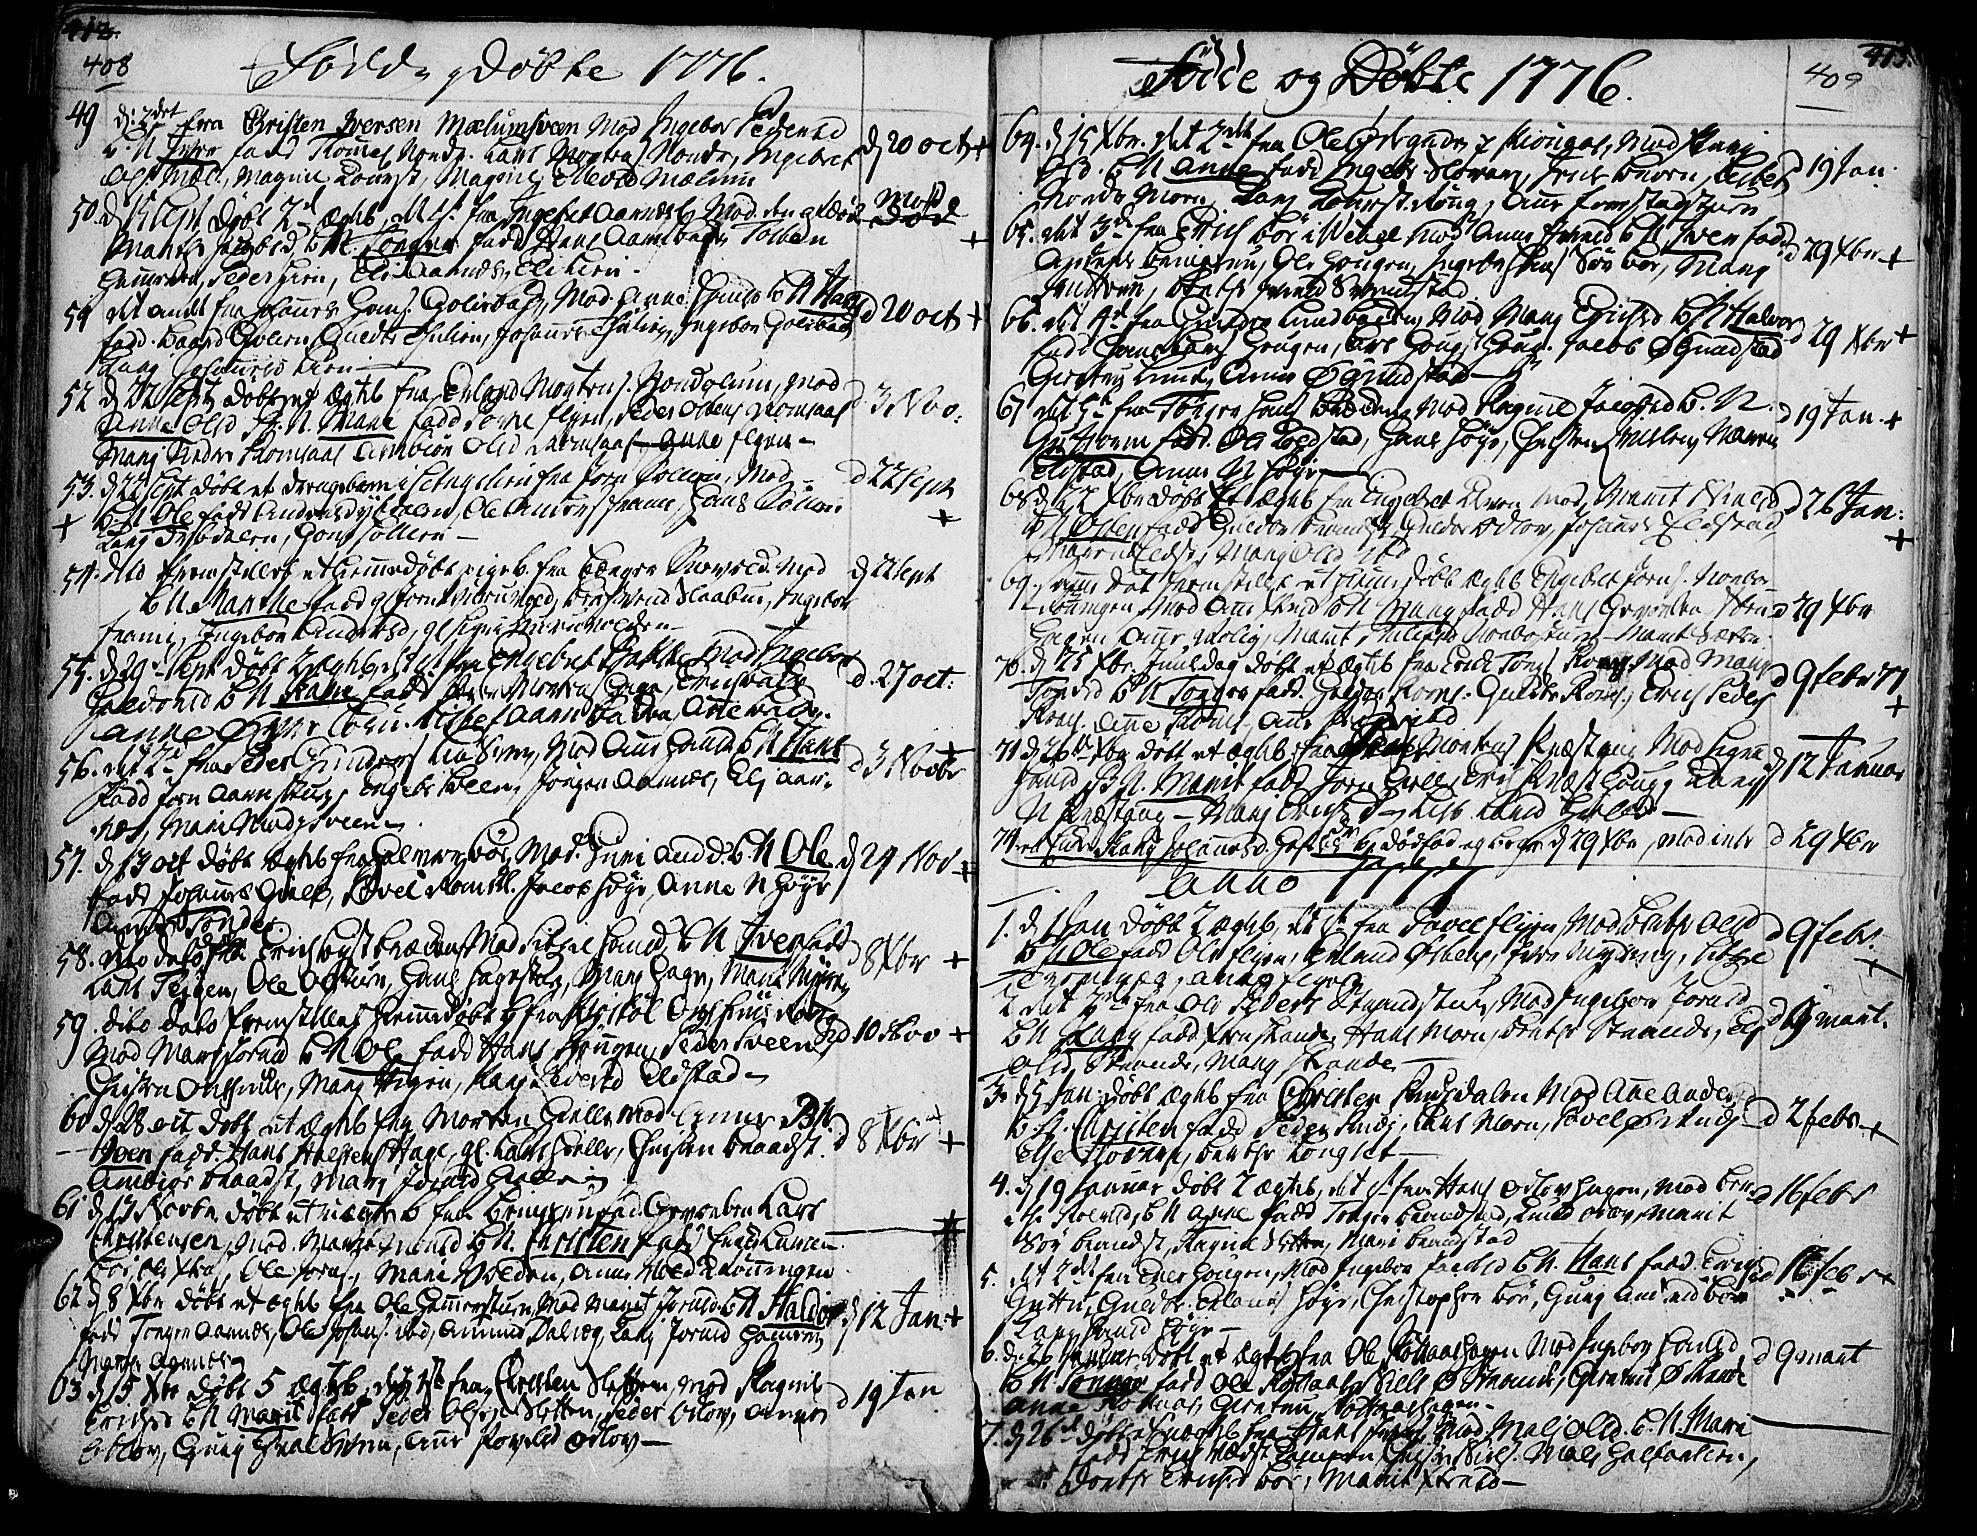 SAH, Ringebu prestekontor, Ministerialbok nr. 2, 1734-1780, s. 408-409